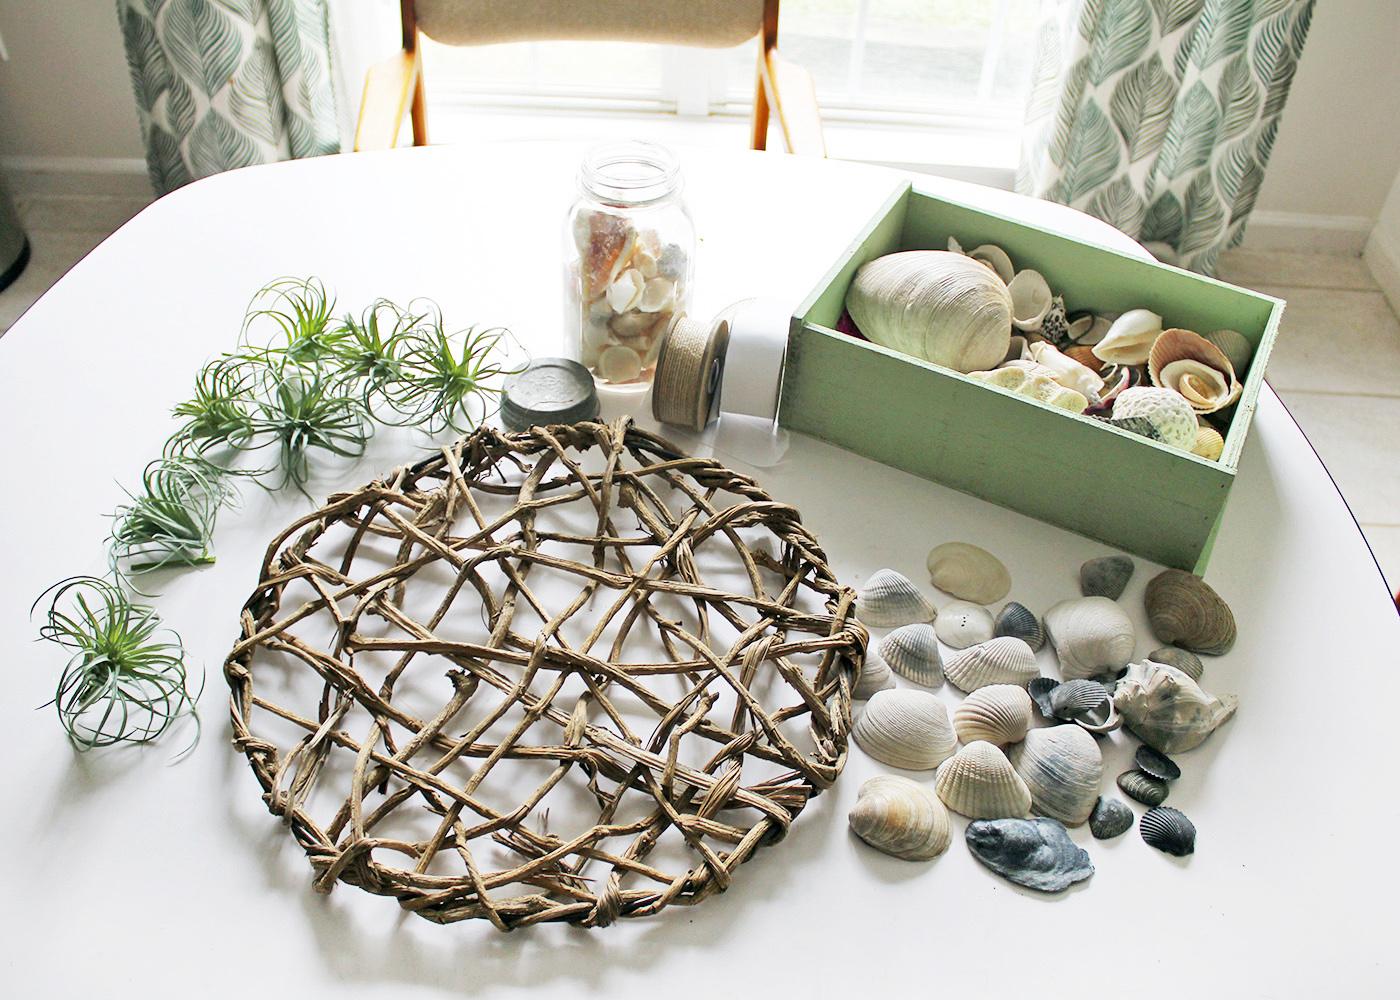 supplies for an air plant wreath with seashells